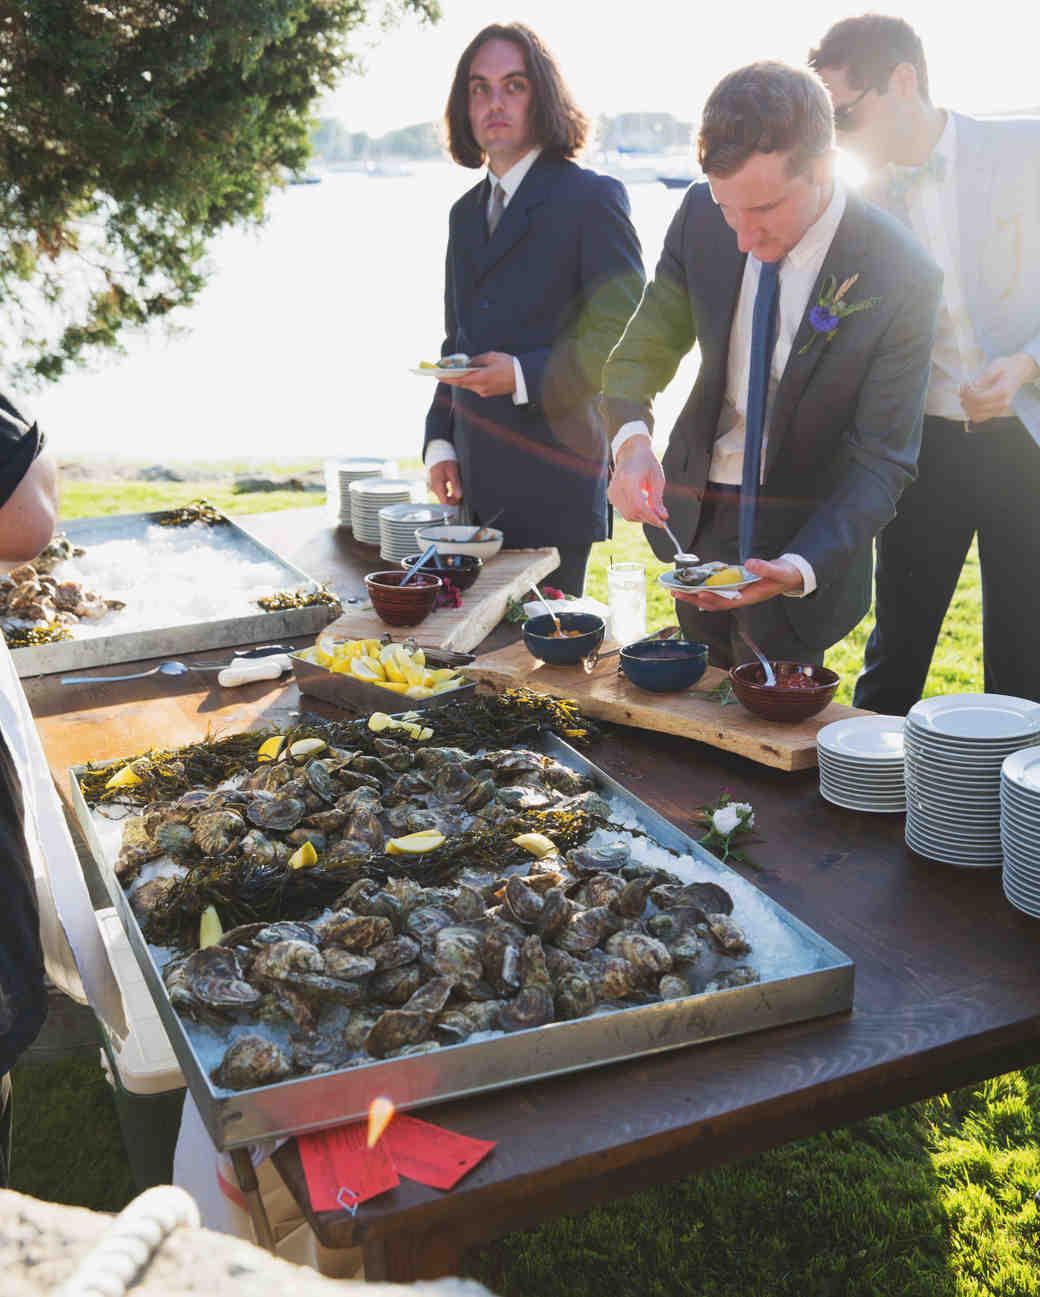 lilly-carter-wedding-oysters-00467-s112037-0715_vert.jpg